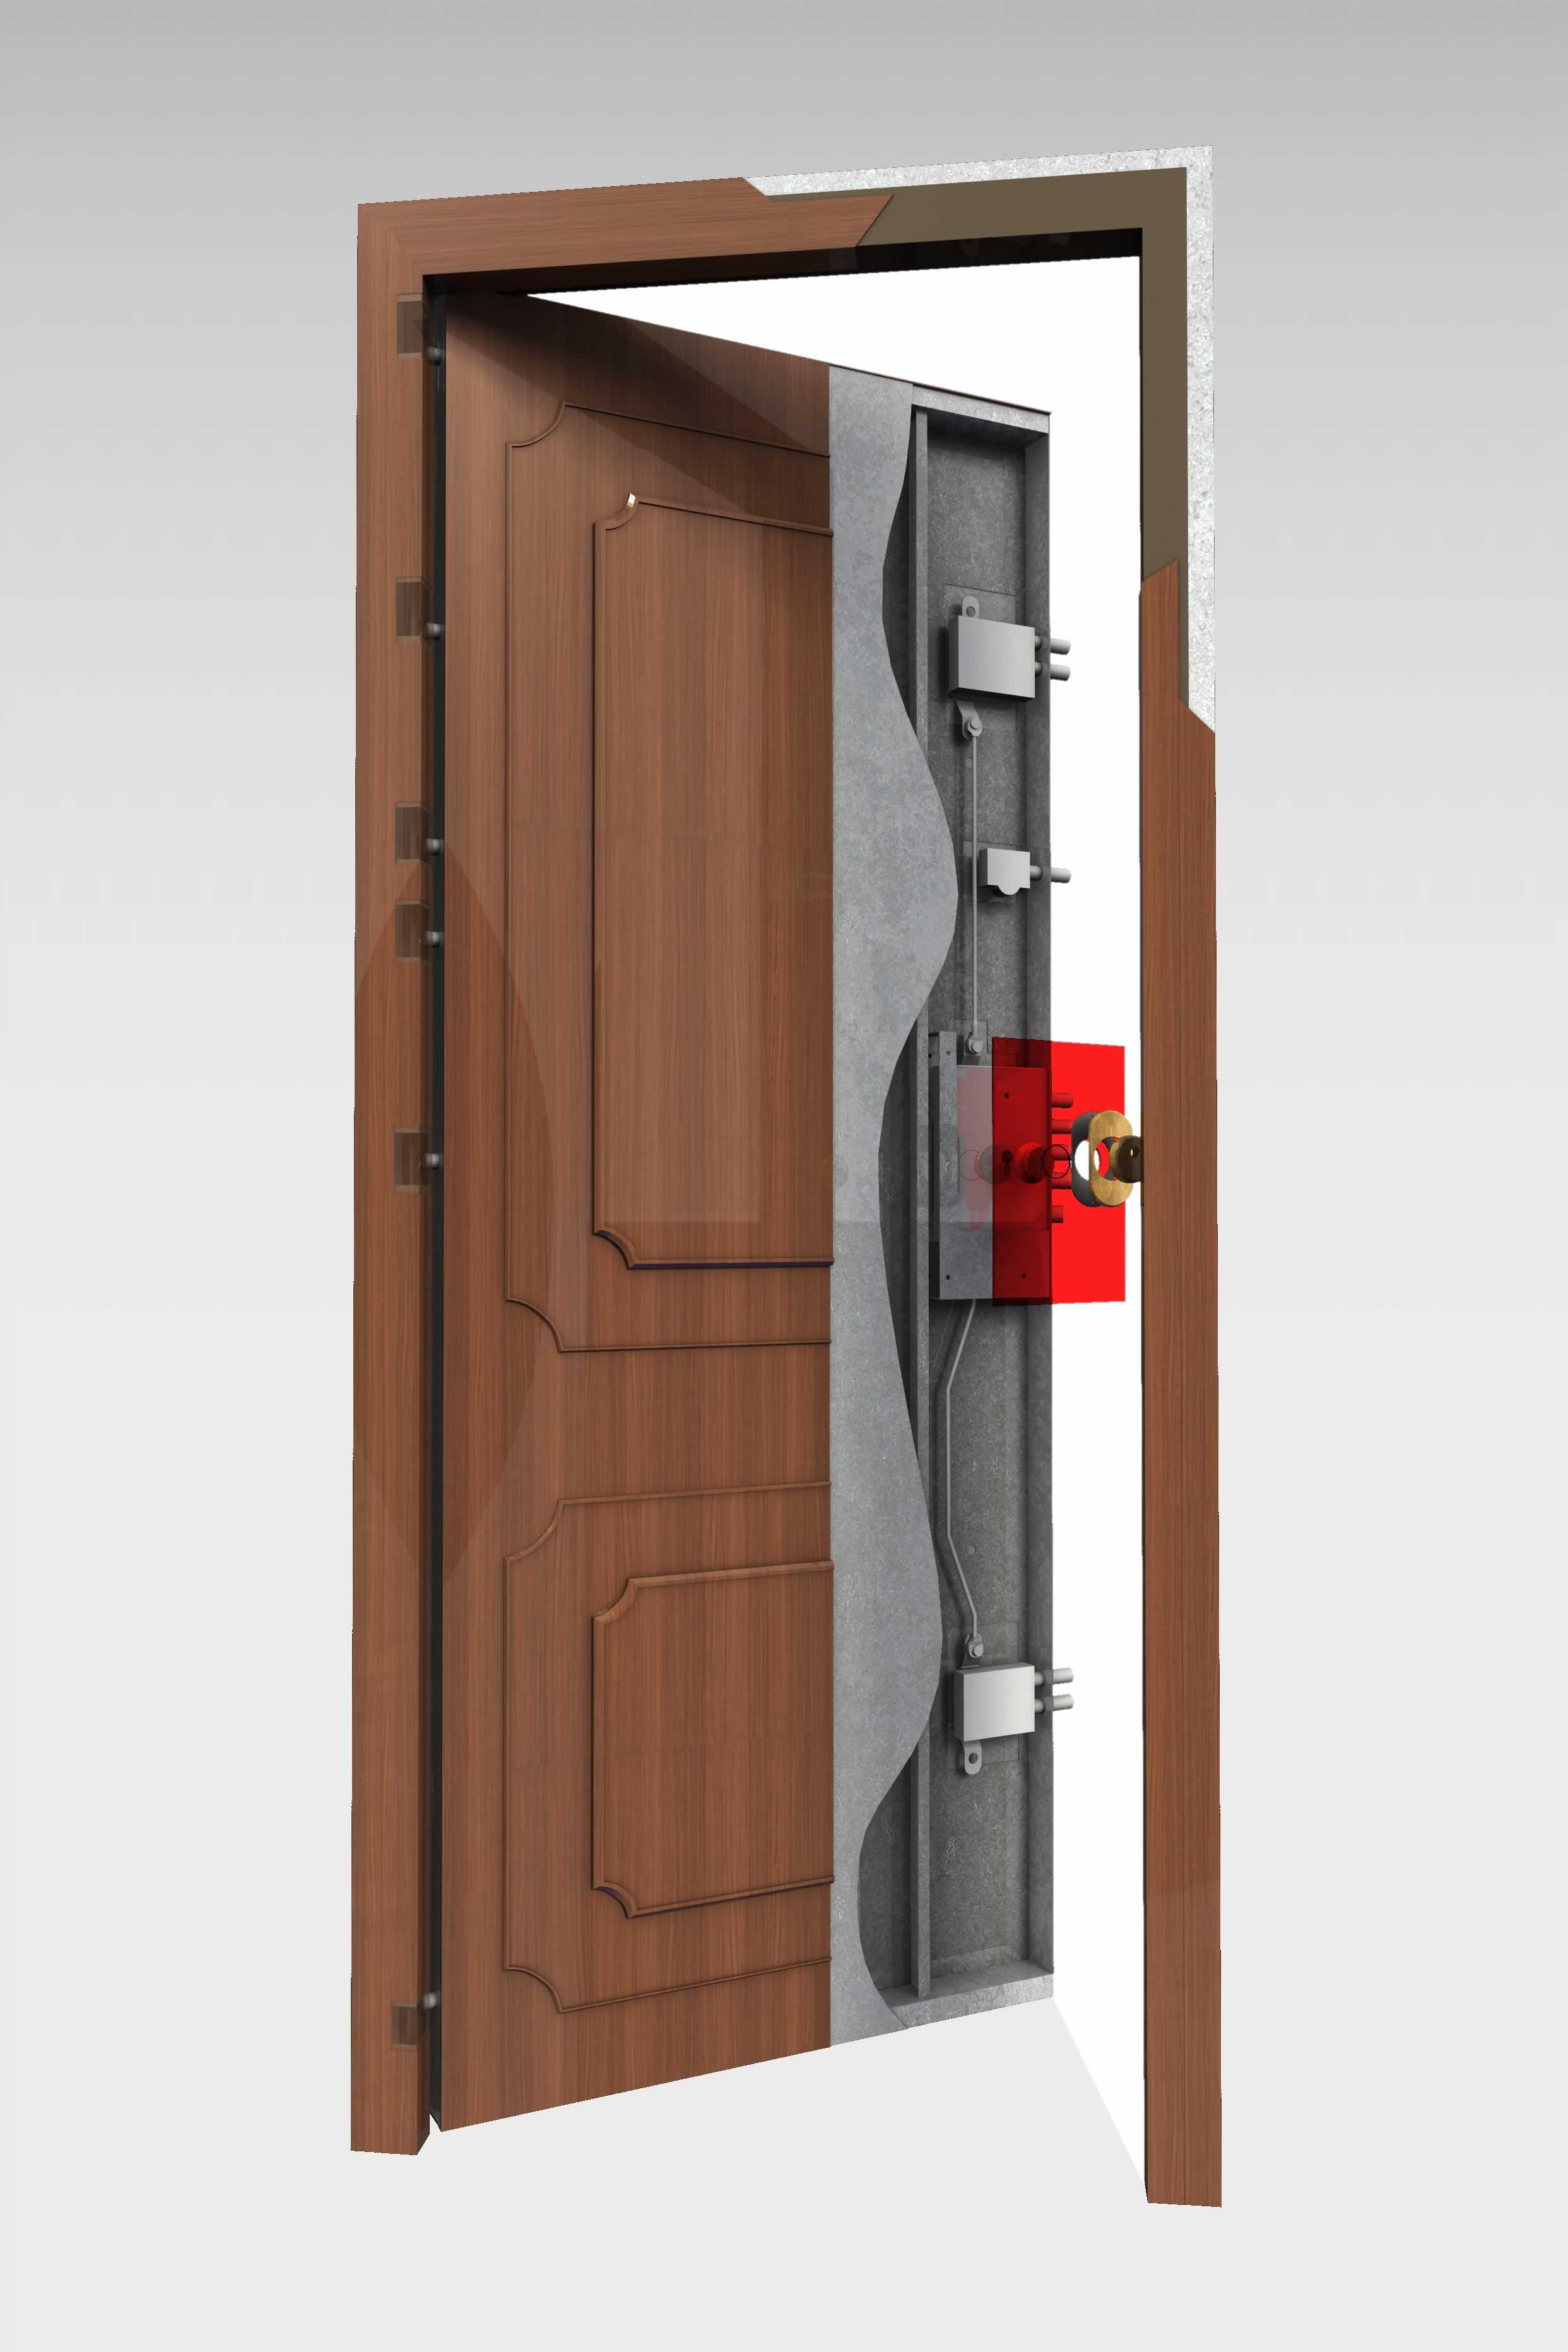 Puerta acorazada 310 roconsa for Puerta blindada casa